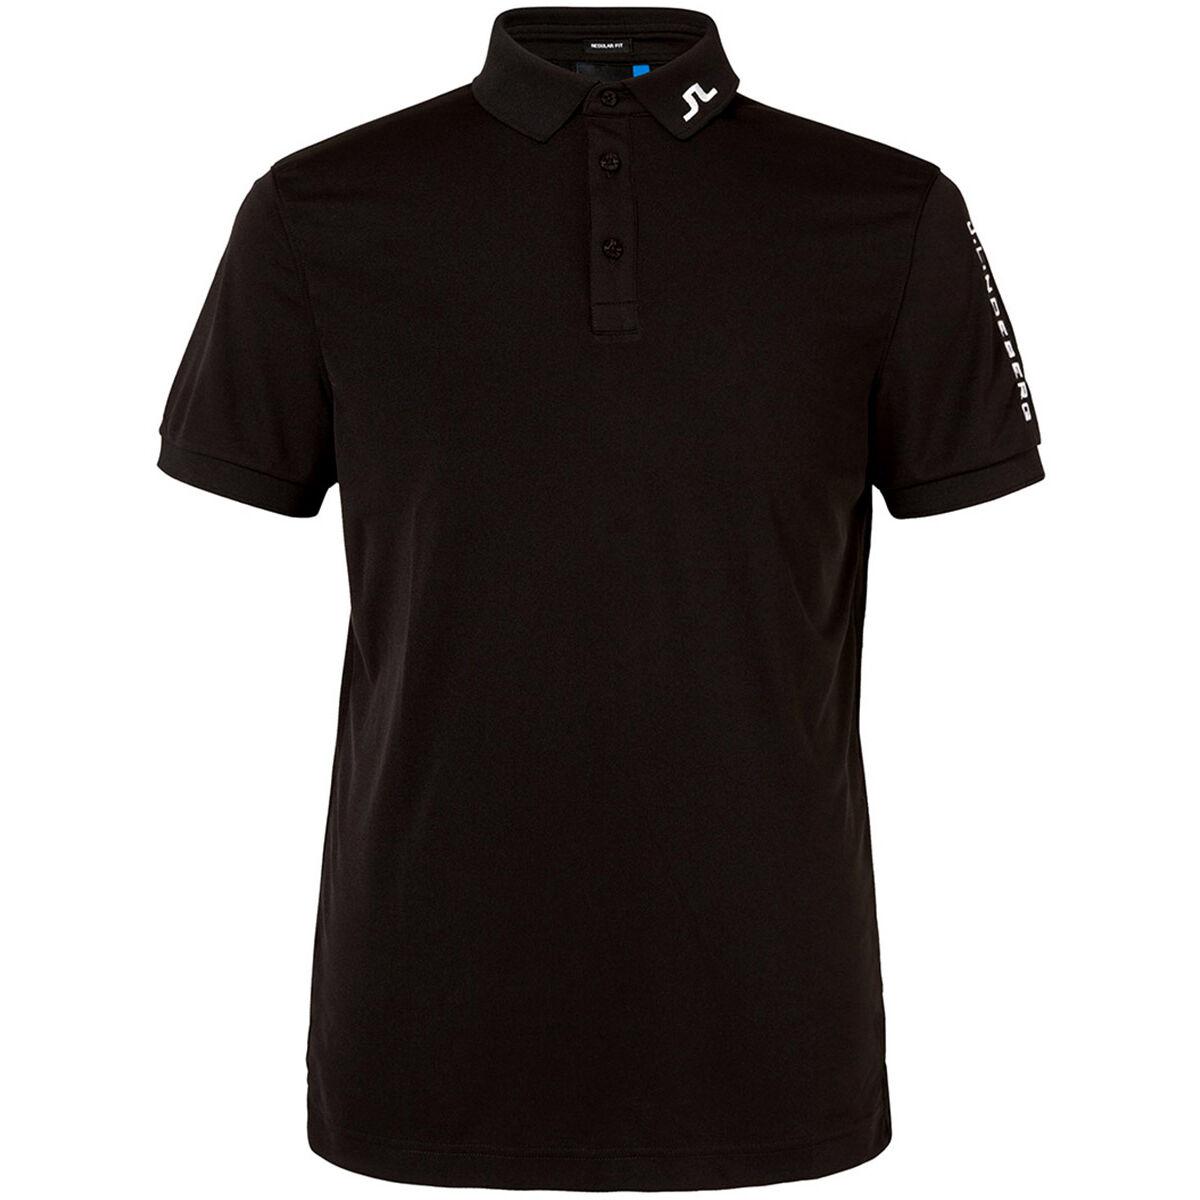 J.Lindeberg J. Lindeberg Mens Black Tour Tech TX Jersey Golf Polo Shirt | American Golf | American Golf